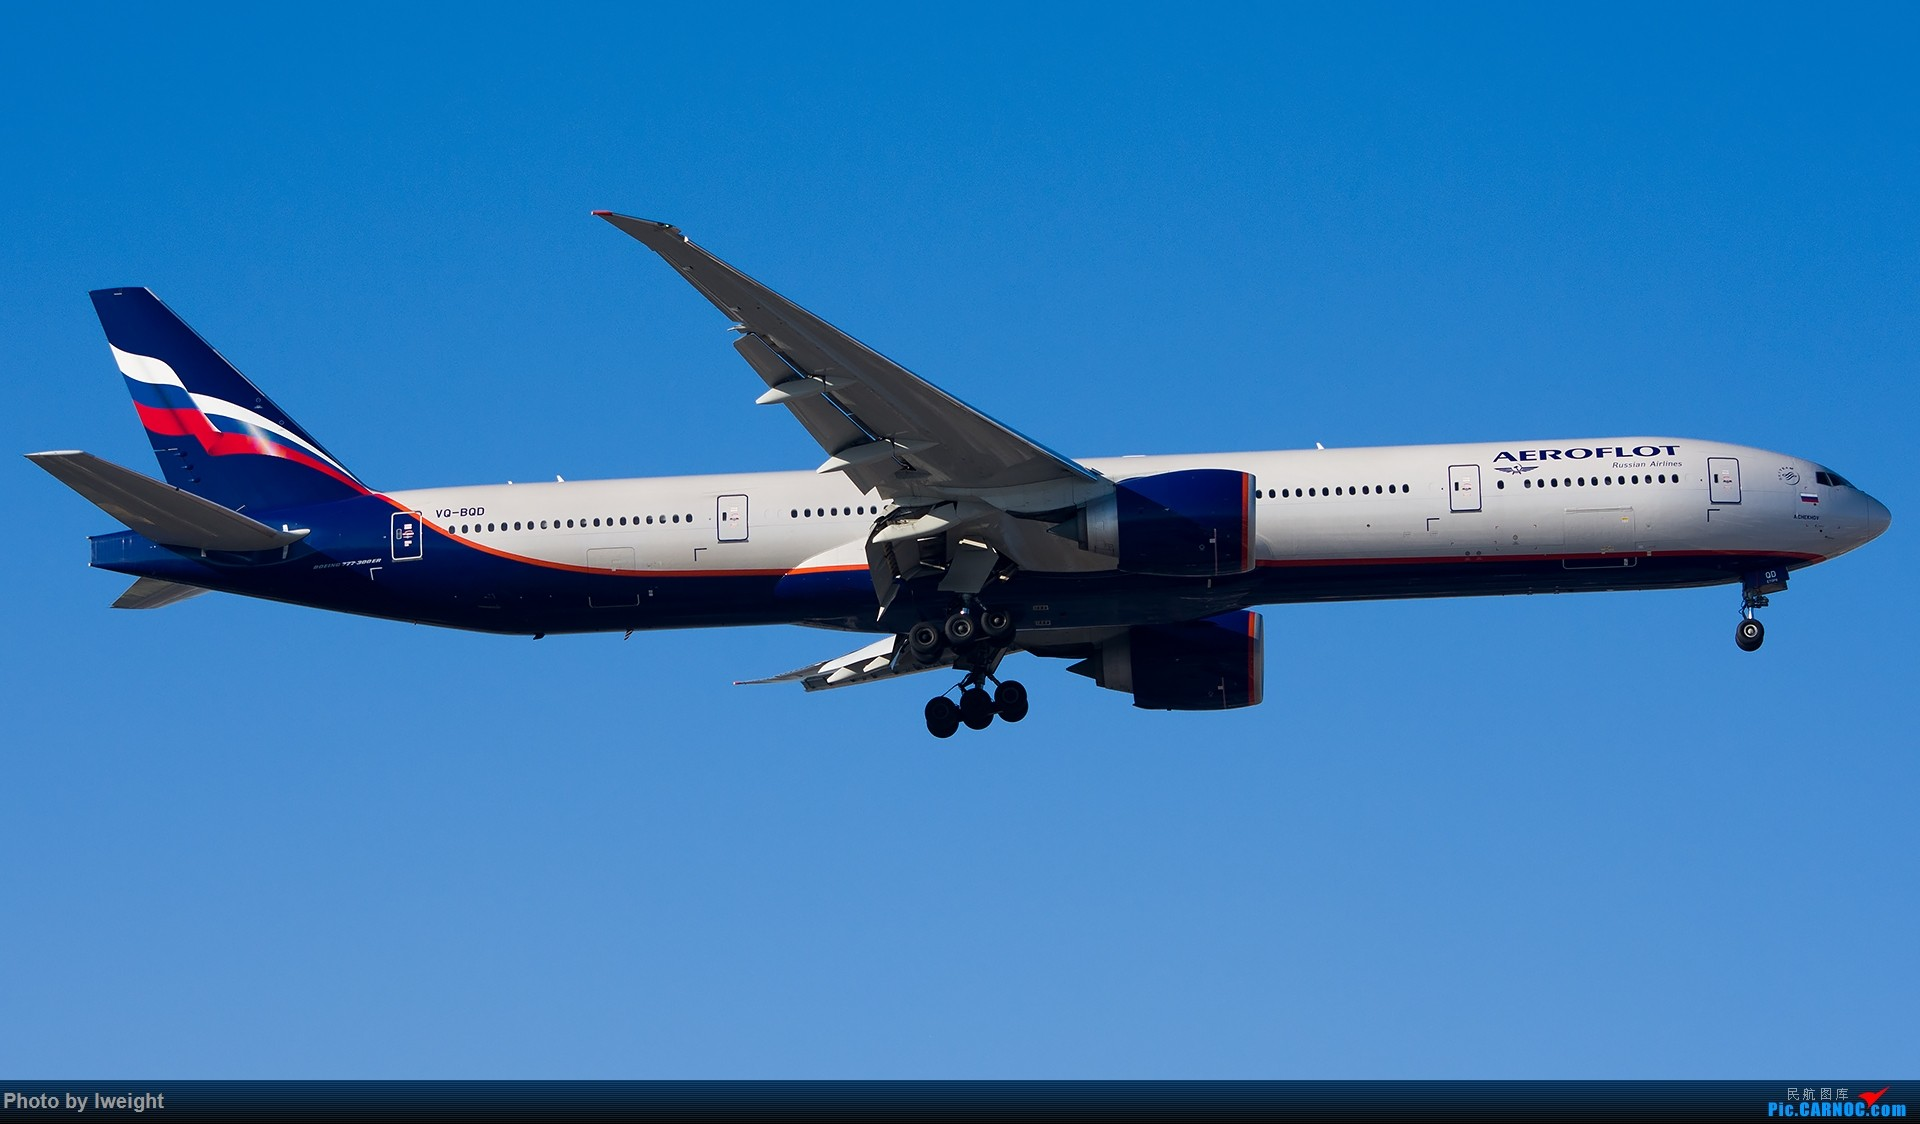 Re:[原创]终于在12月的北京等到了一个晴天的周末,出来拍拍飞机【2015-12-5】 BOEING 777-300ER VQ-BQD 中国北京首都国际机场